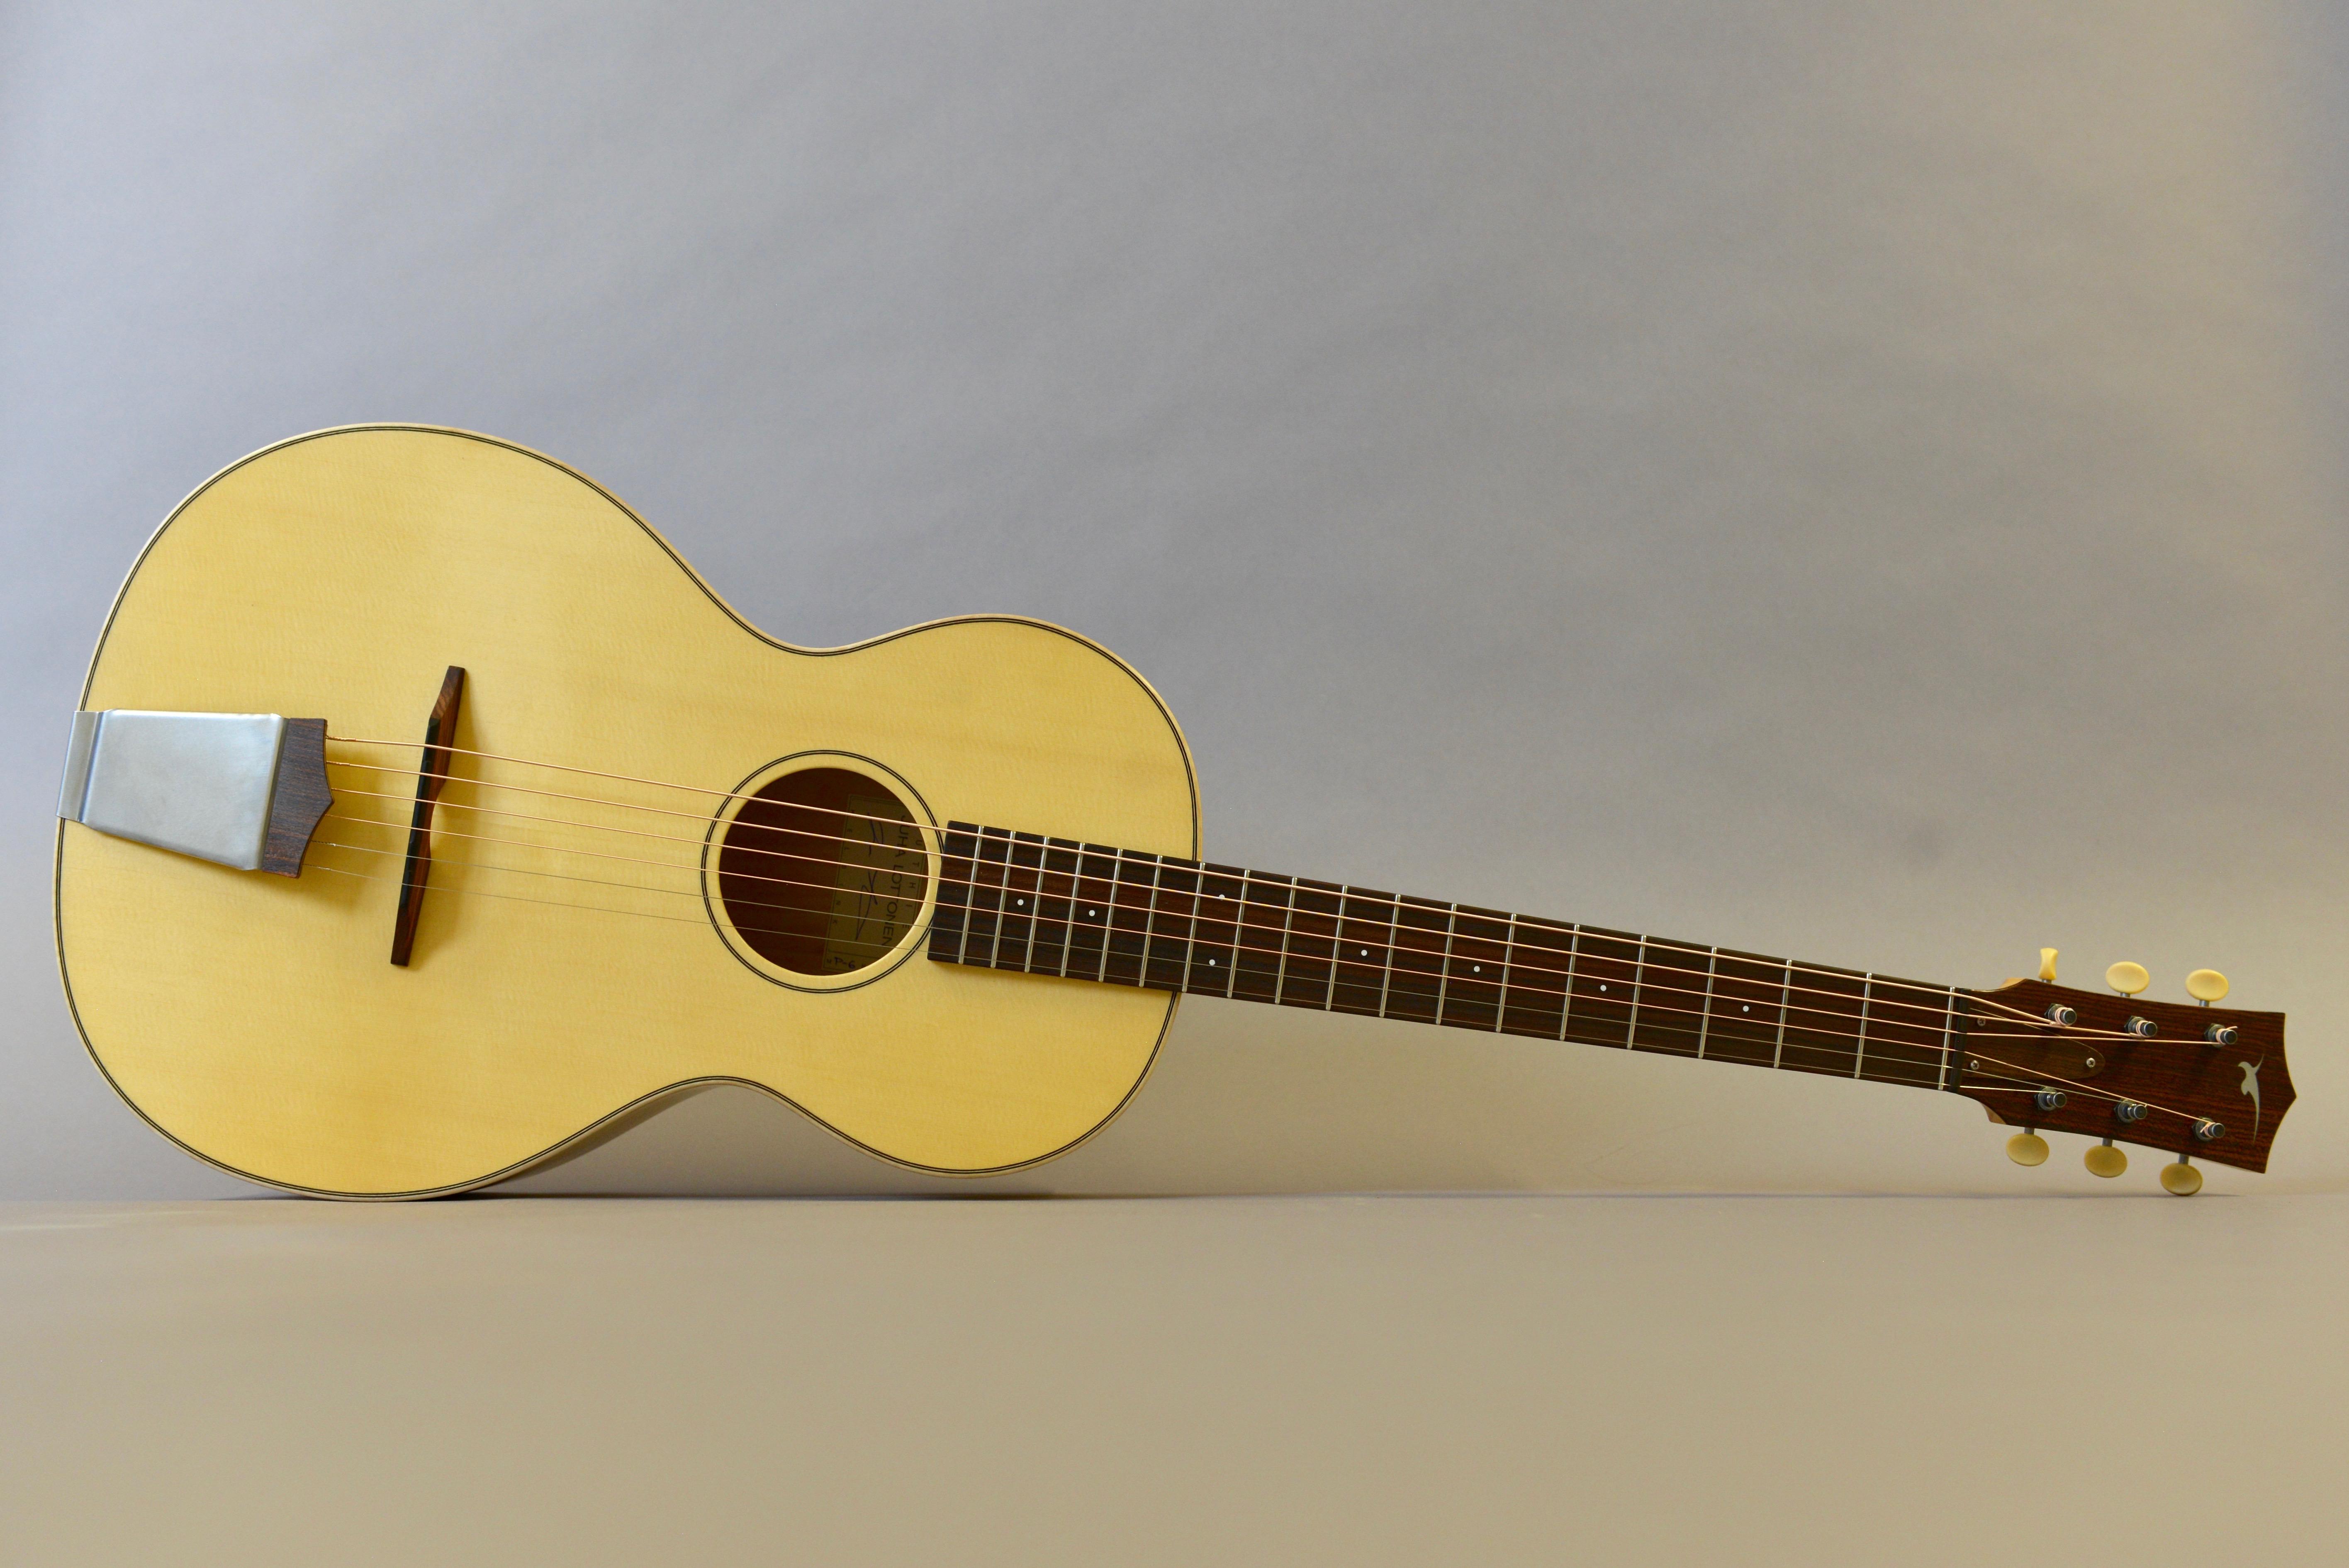 Lottonen P-6 / P-12   Lottonen Handmade Guitars